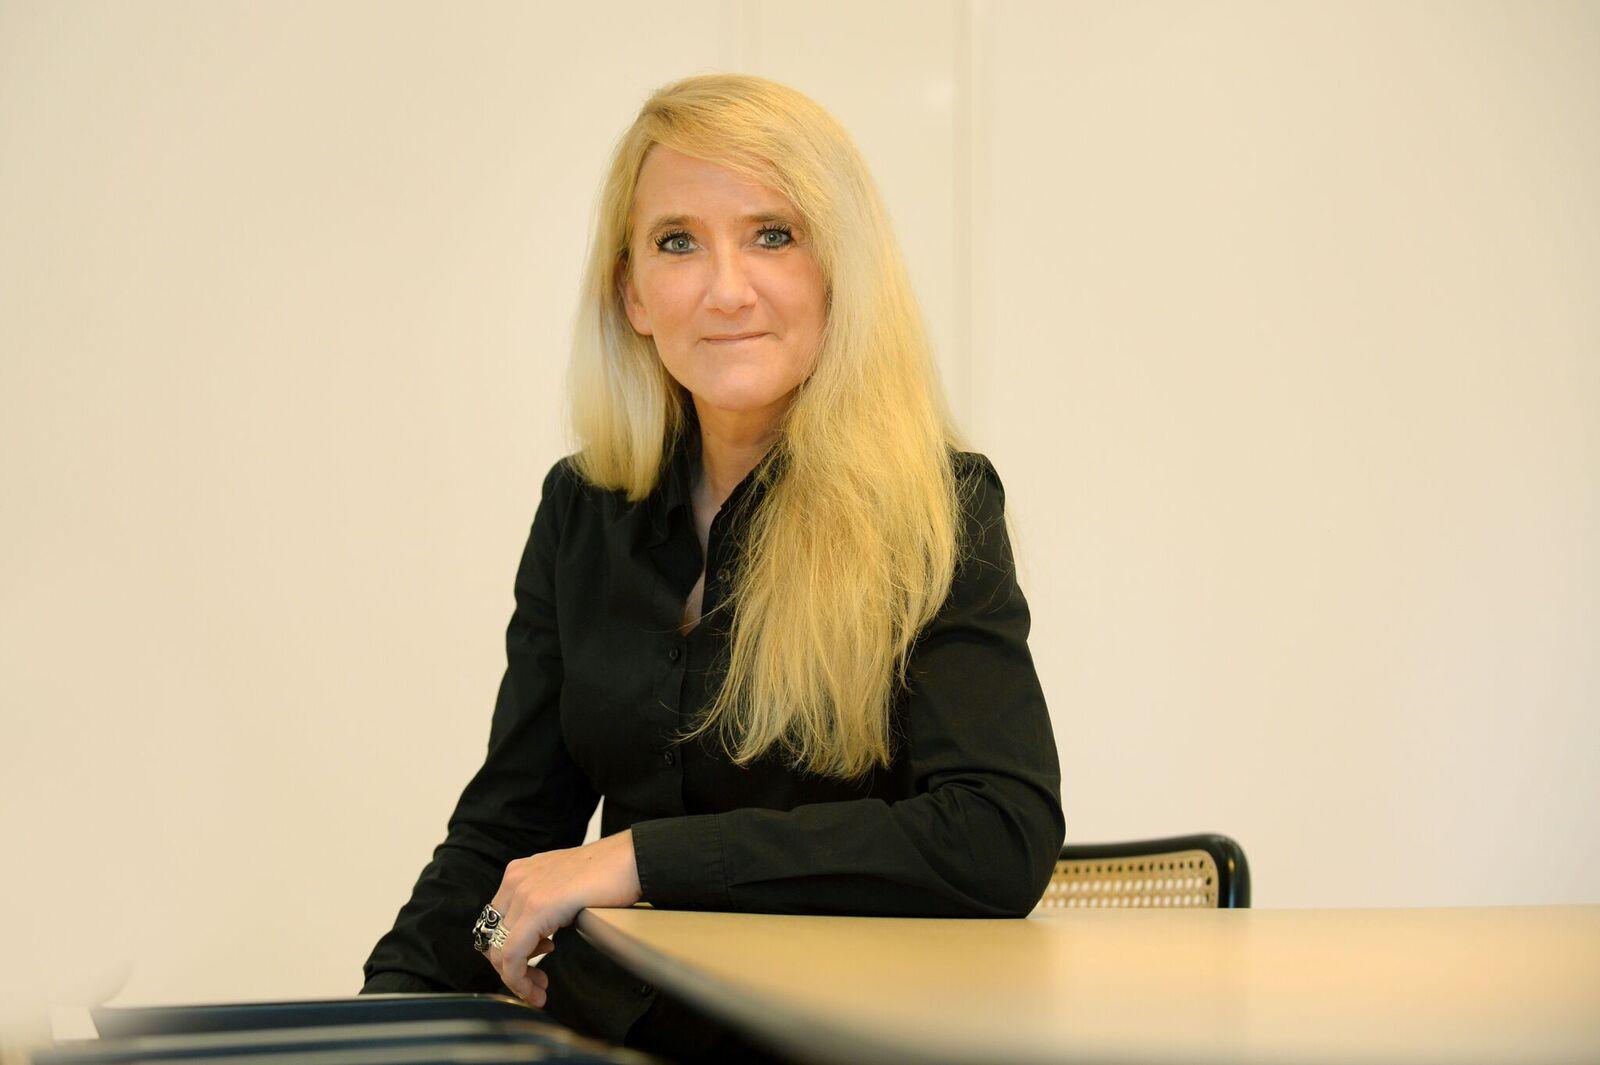 Katrin Schröder